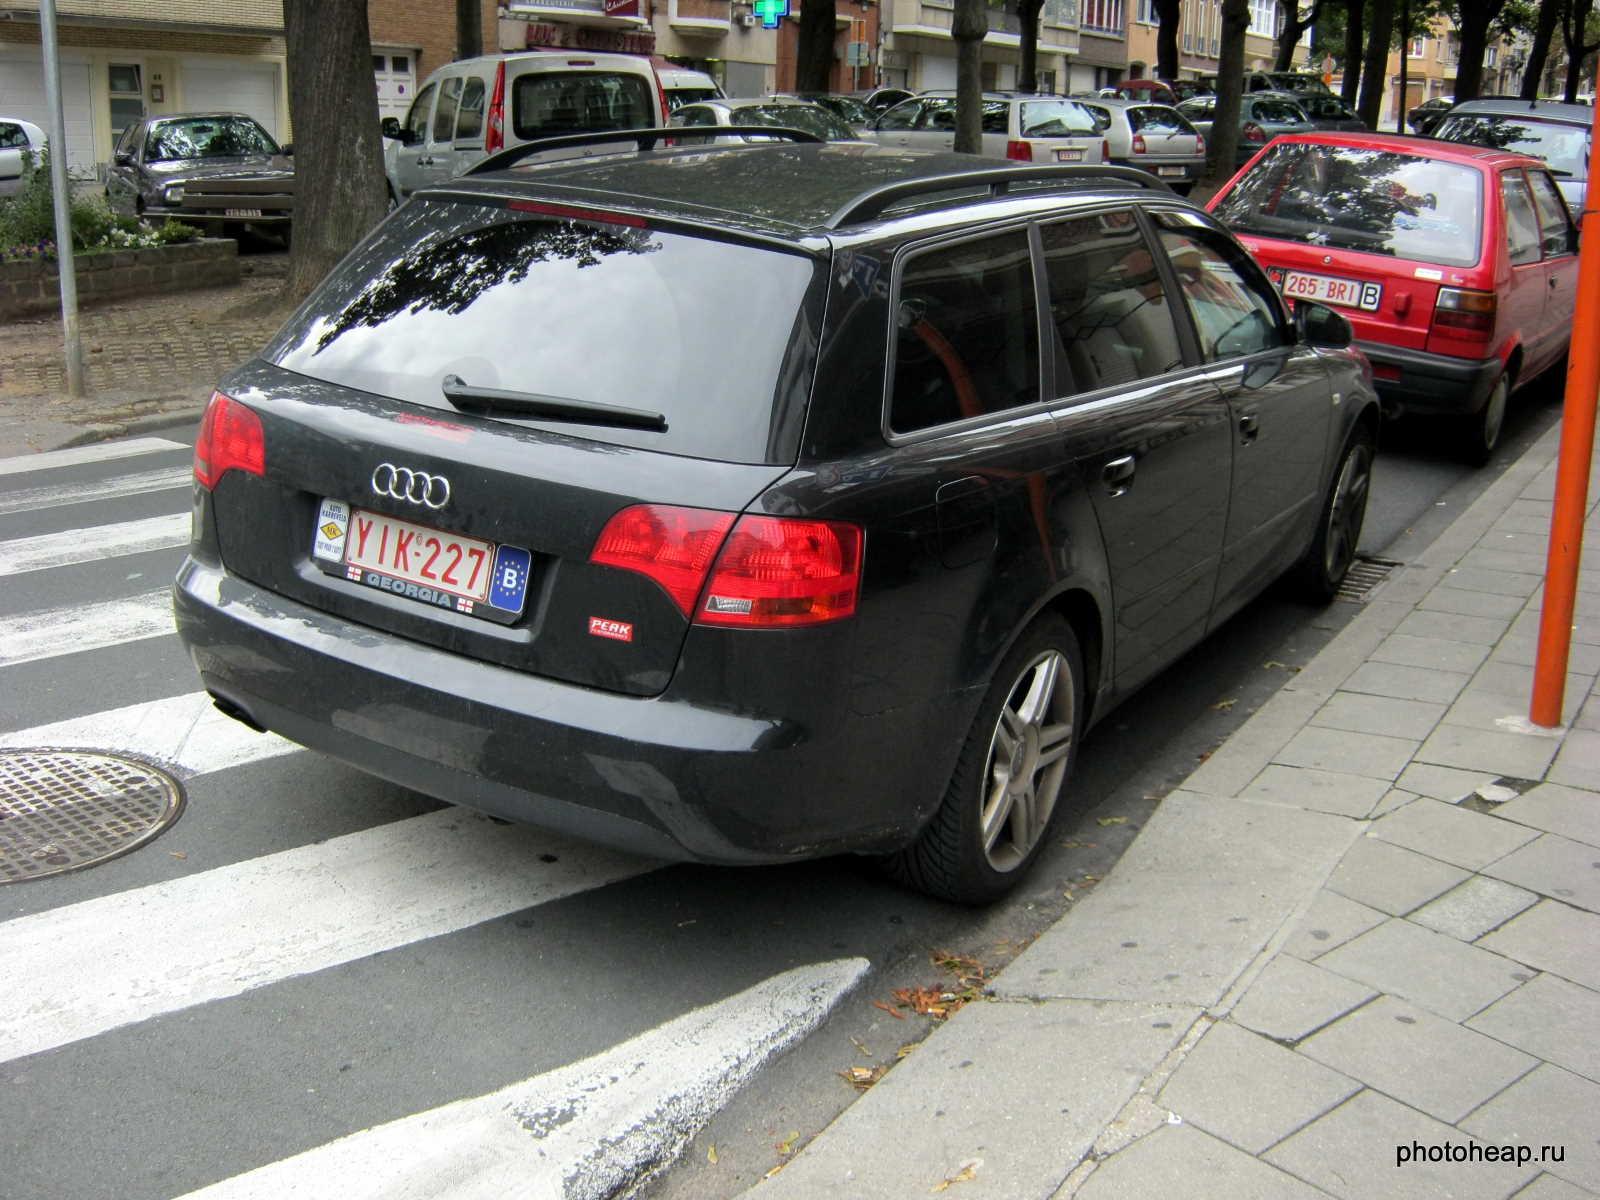 Brussels - Georgia license plate